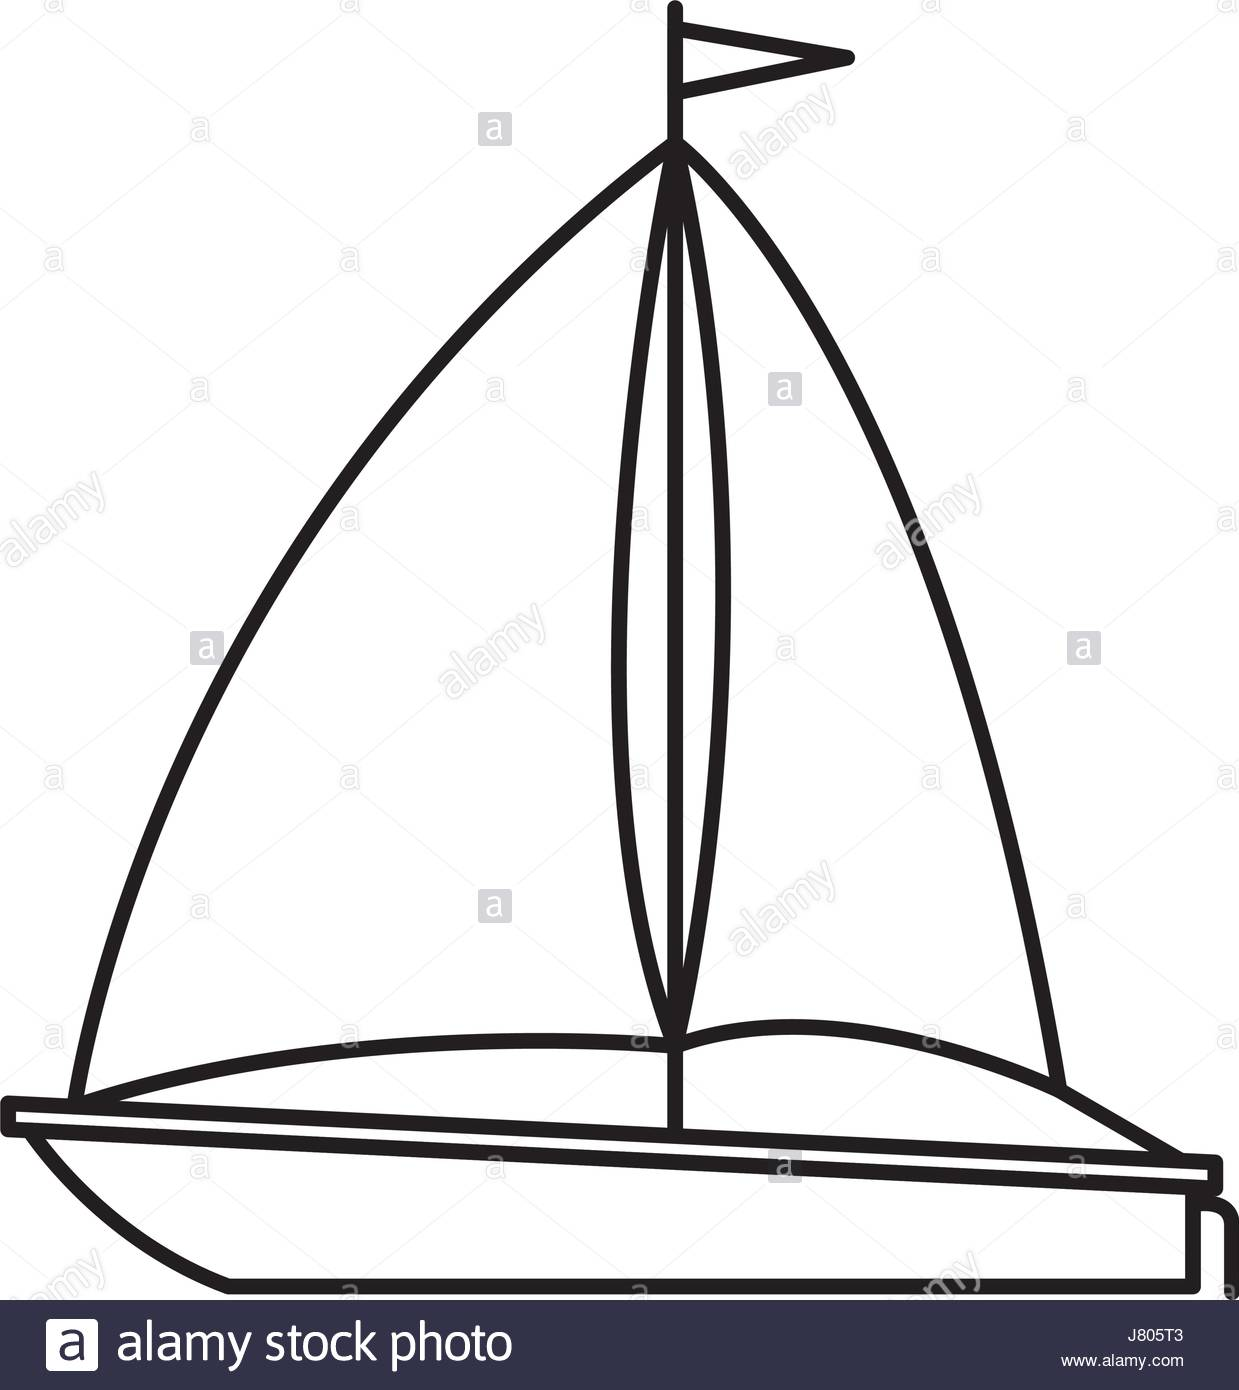 1239x1390 Black Silhouette Of Sailboat Icon Stock Vector Art Amp Illustration